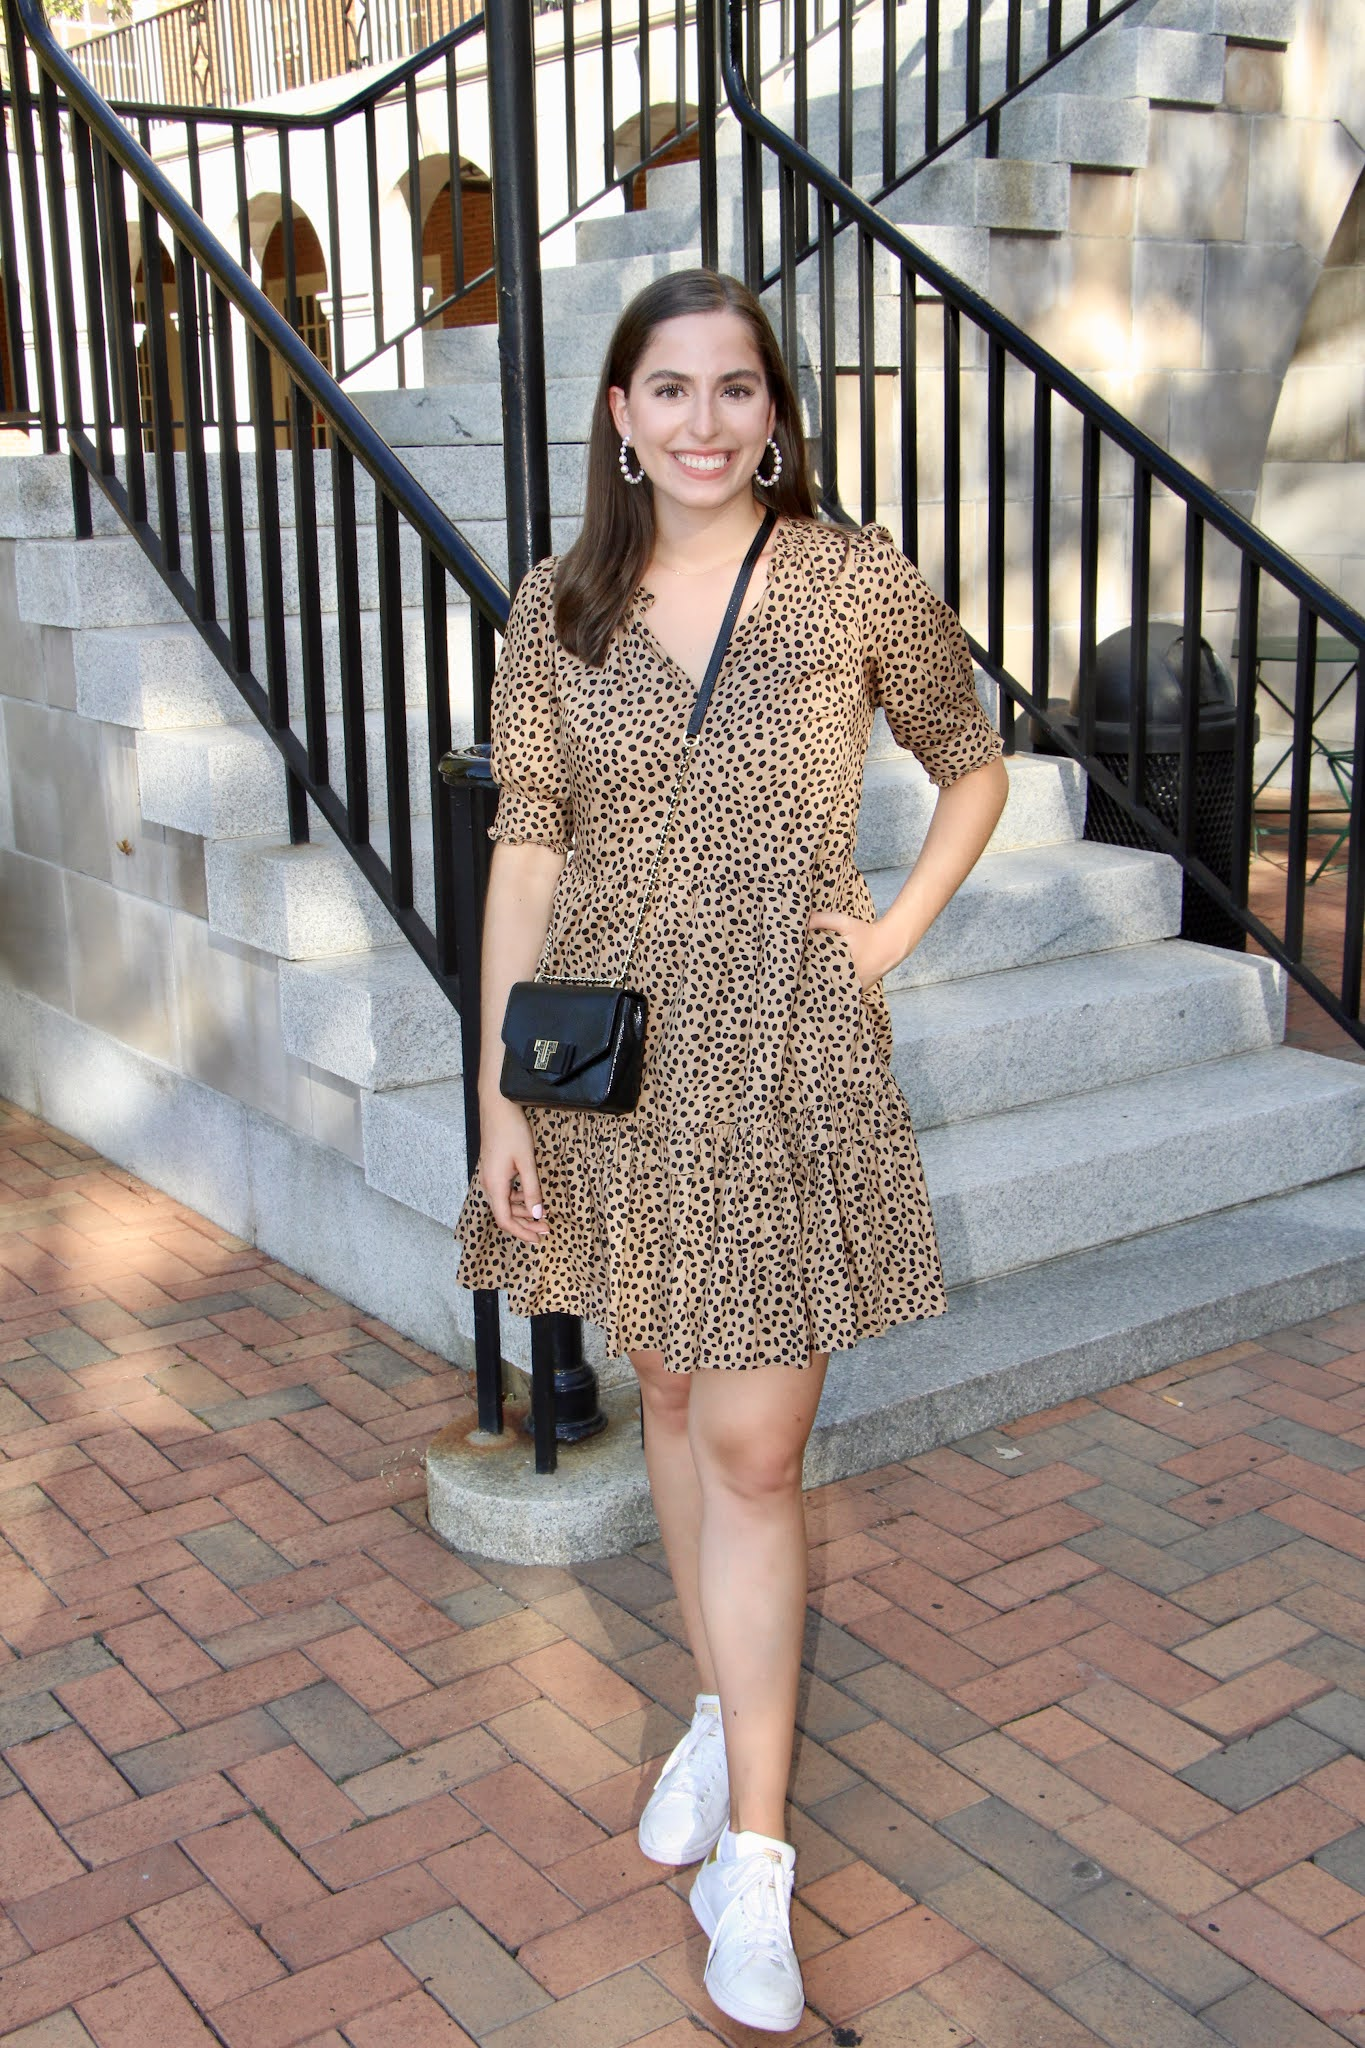 cheetah dress, white shoes, preppy, white sneakers